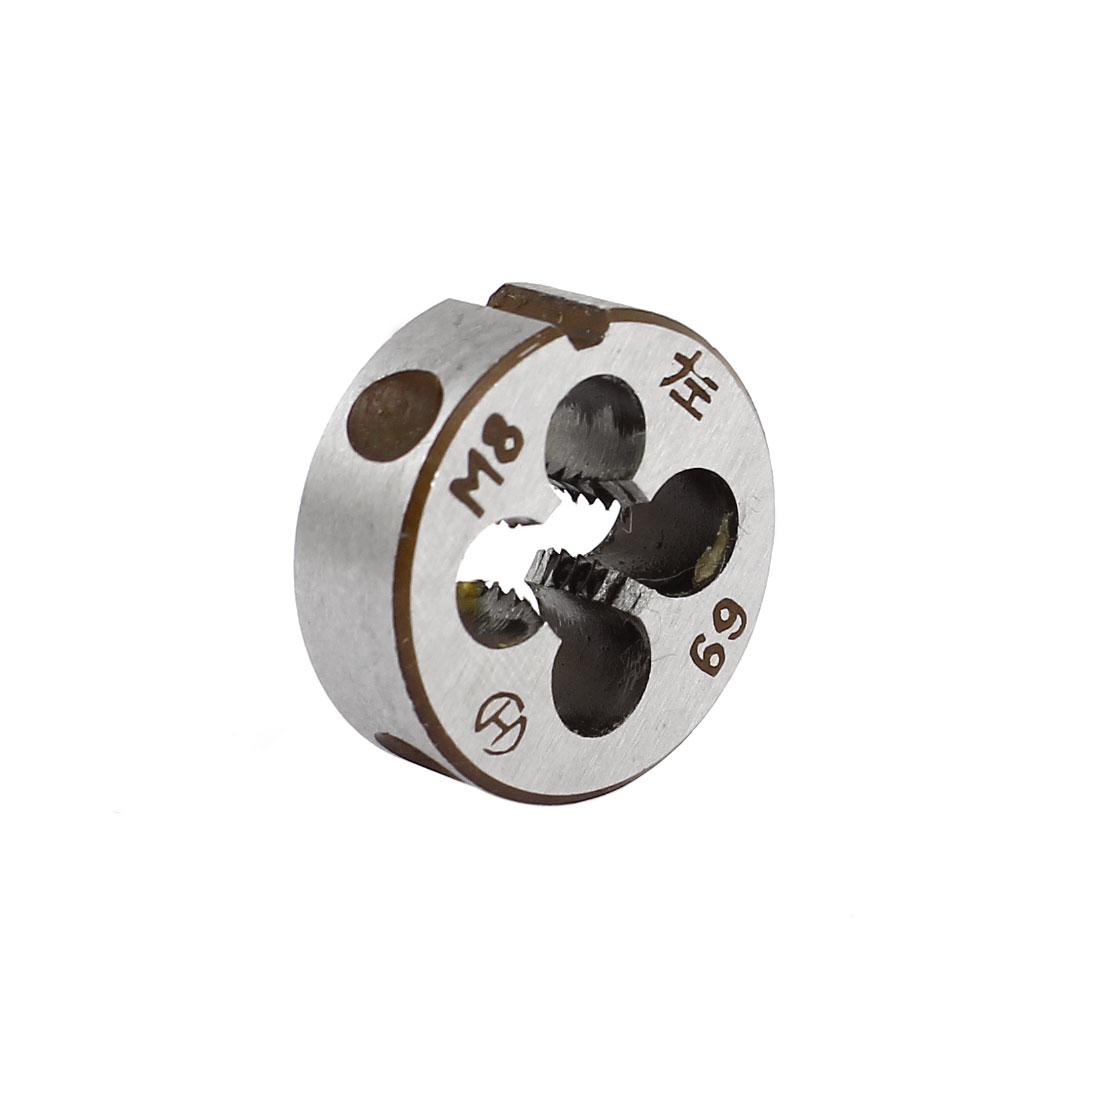 "M8 x 1.25mm Metric Screw 1"" OD Dia Steel Round Threading Die Thread Cutting Tool"